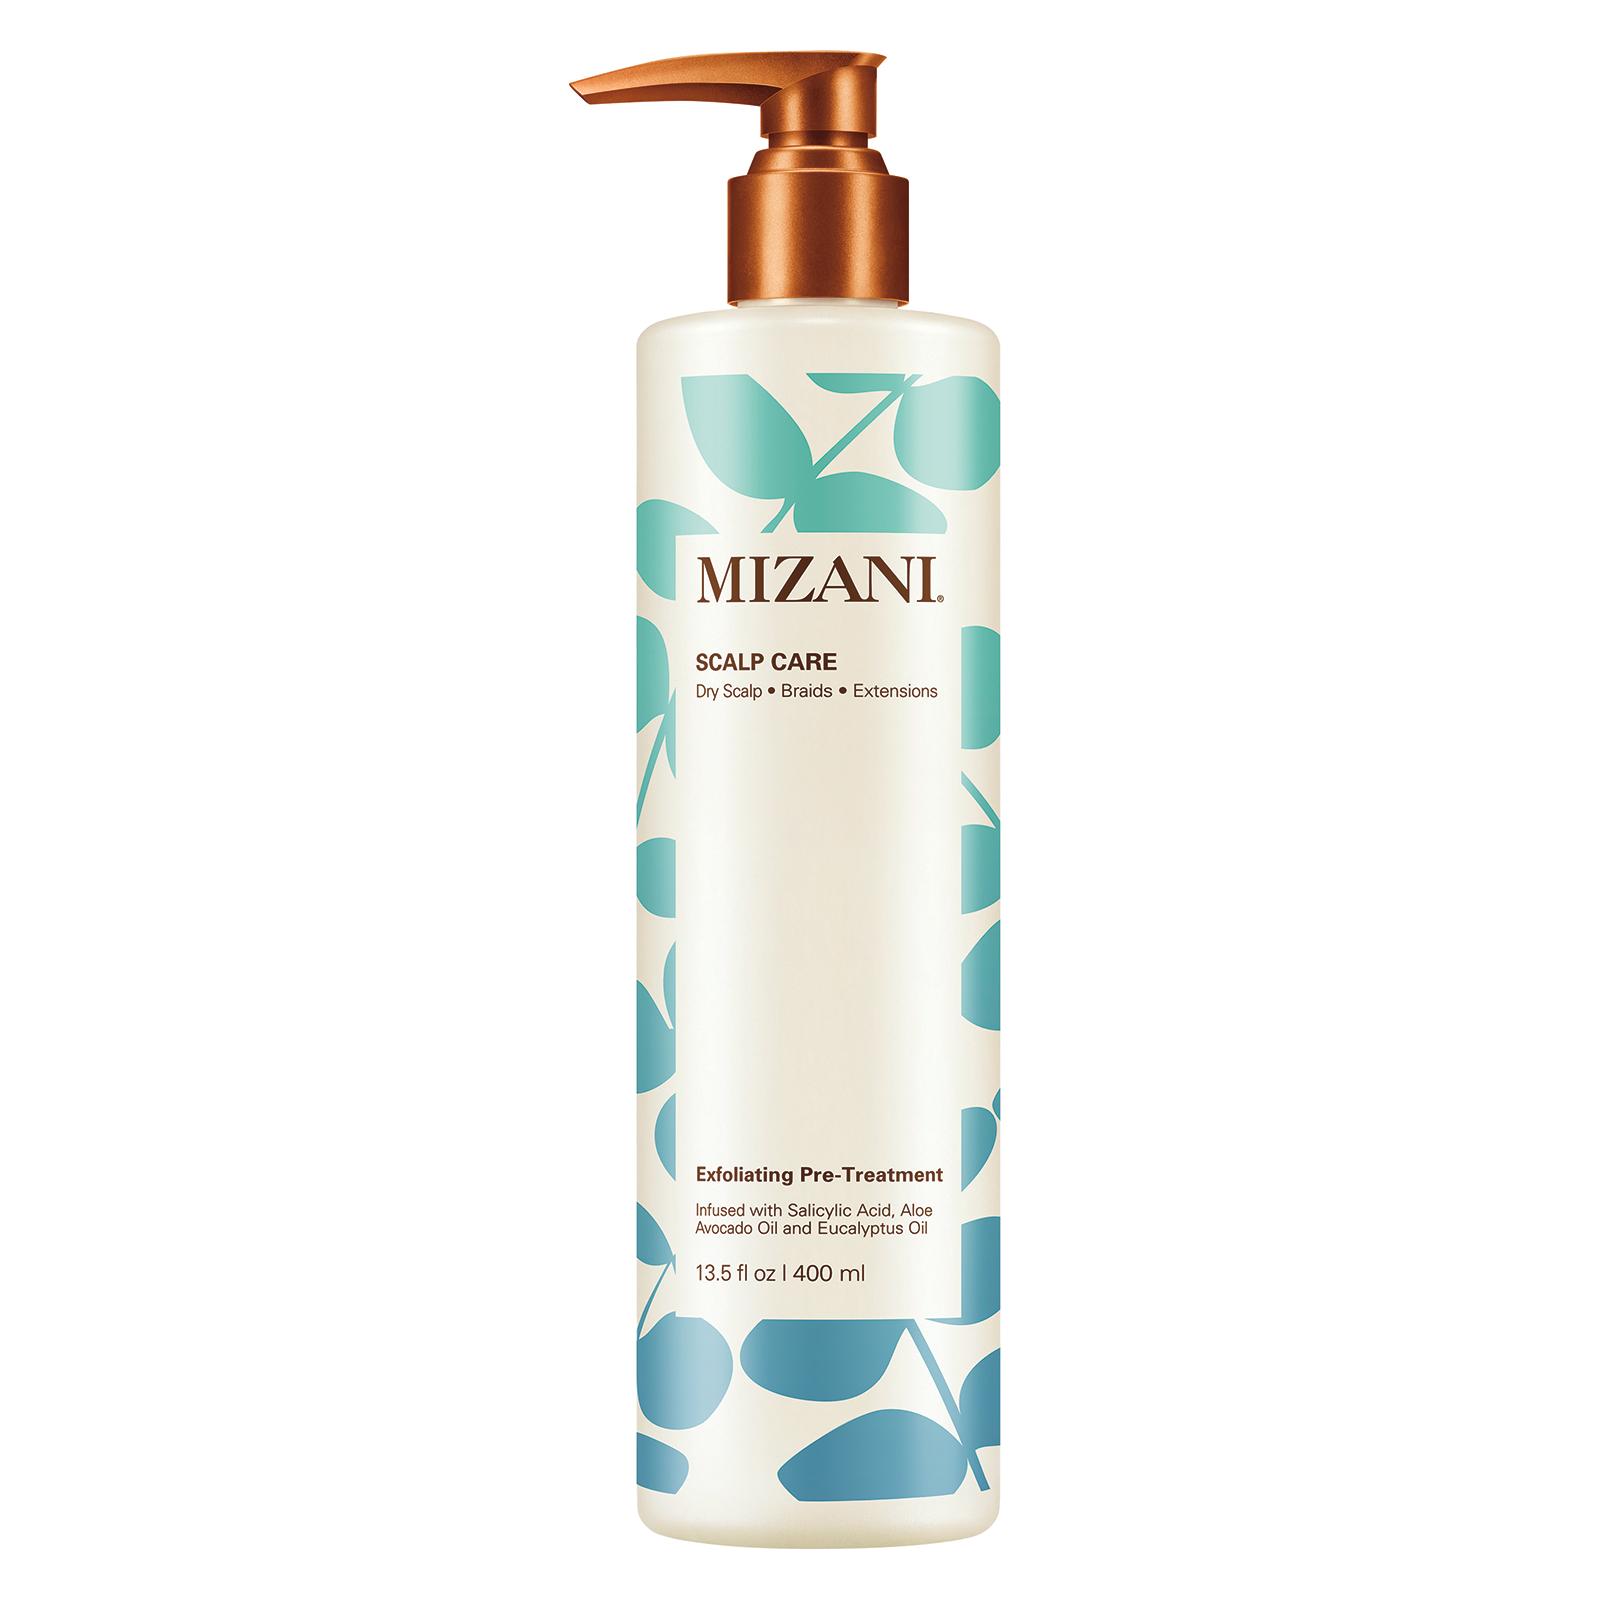 Scalp Care Exfoliating Pre-Treatment - Mizani | CosmoProf